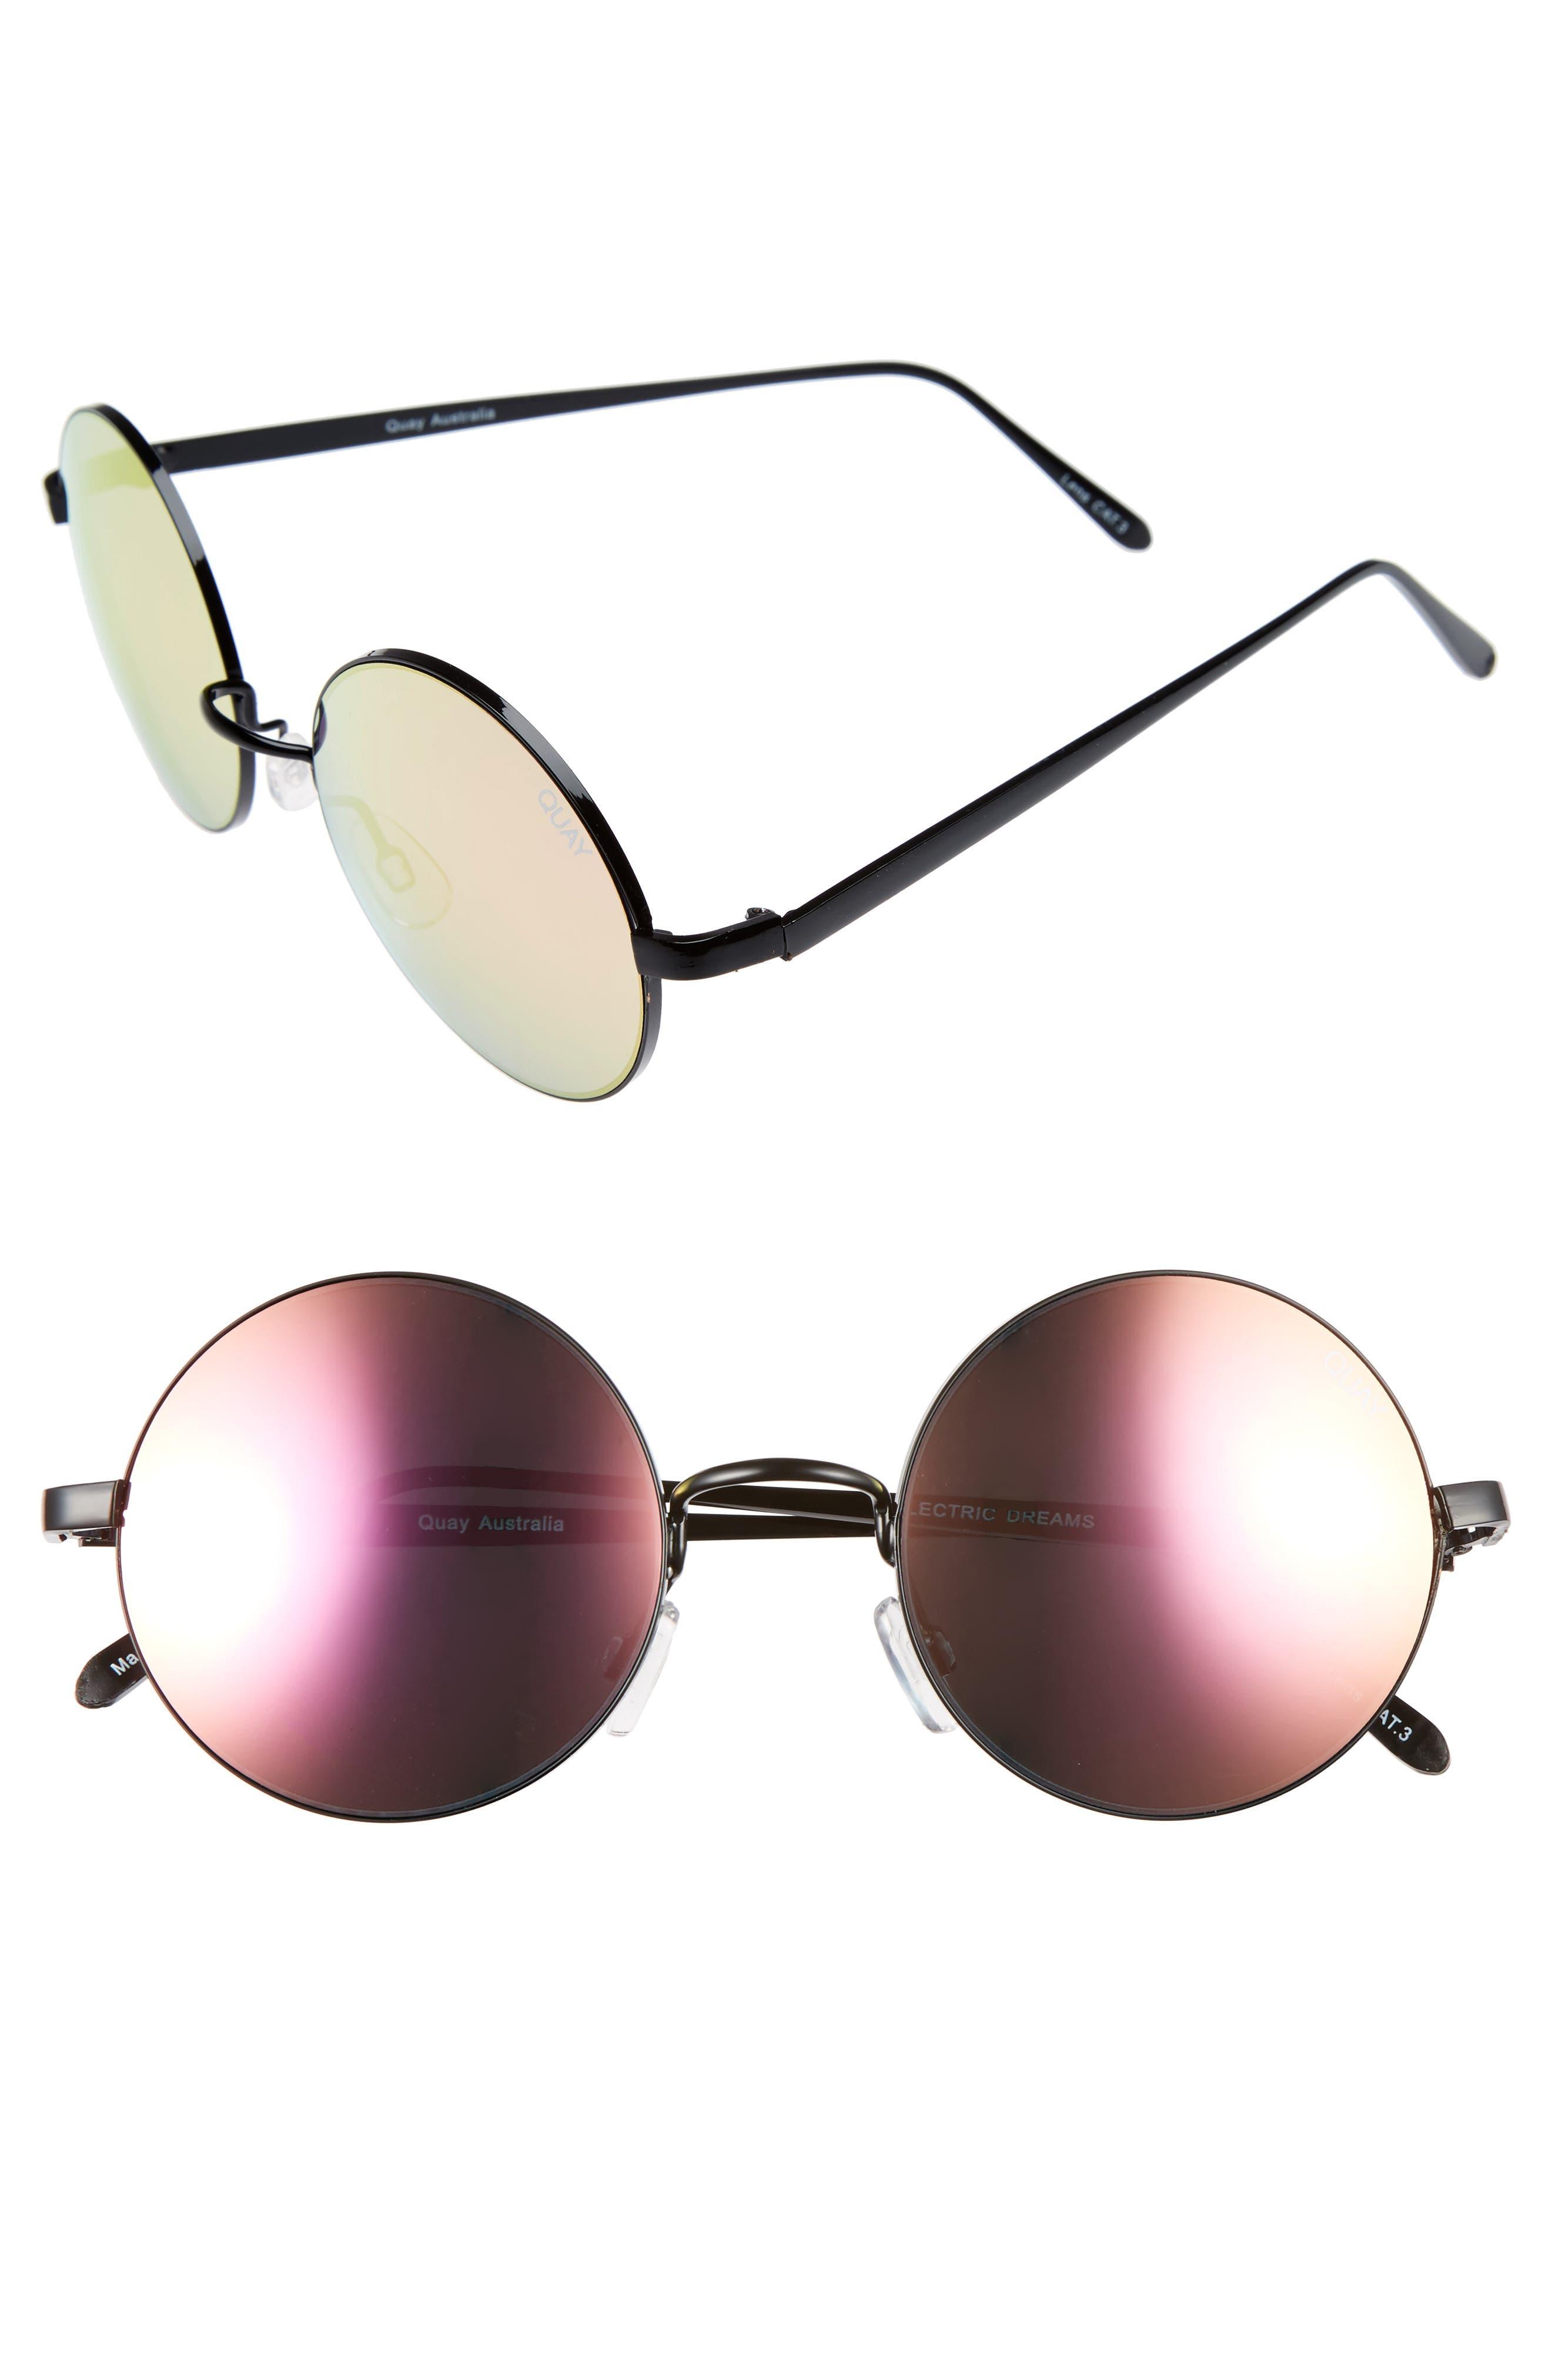 Quay Australia 'Electric Dreams' 52mm Round Sunglasses